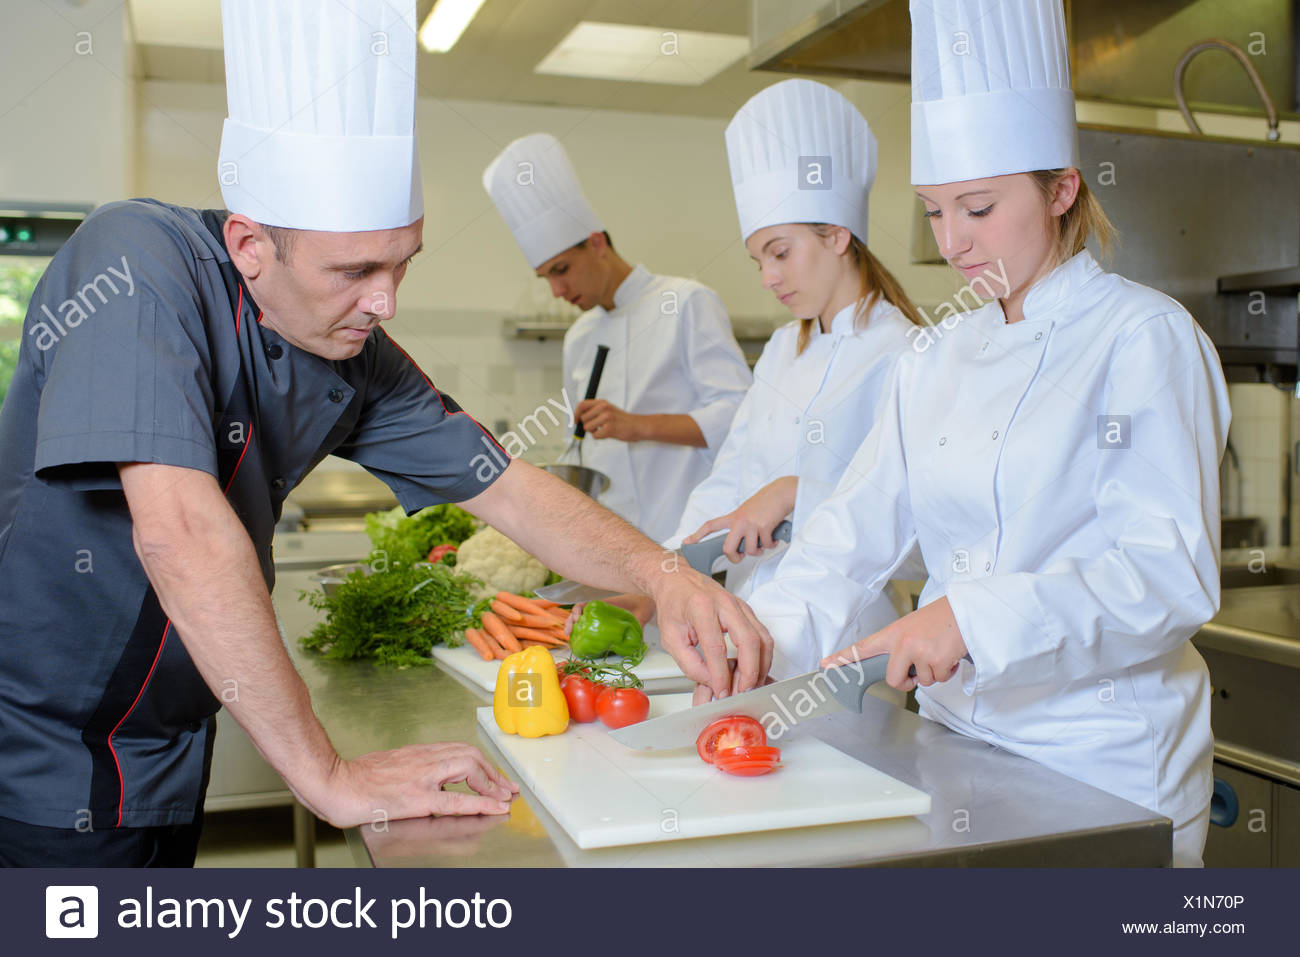 technique in cutting a tomato - Stock Image